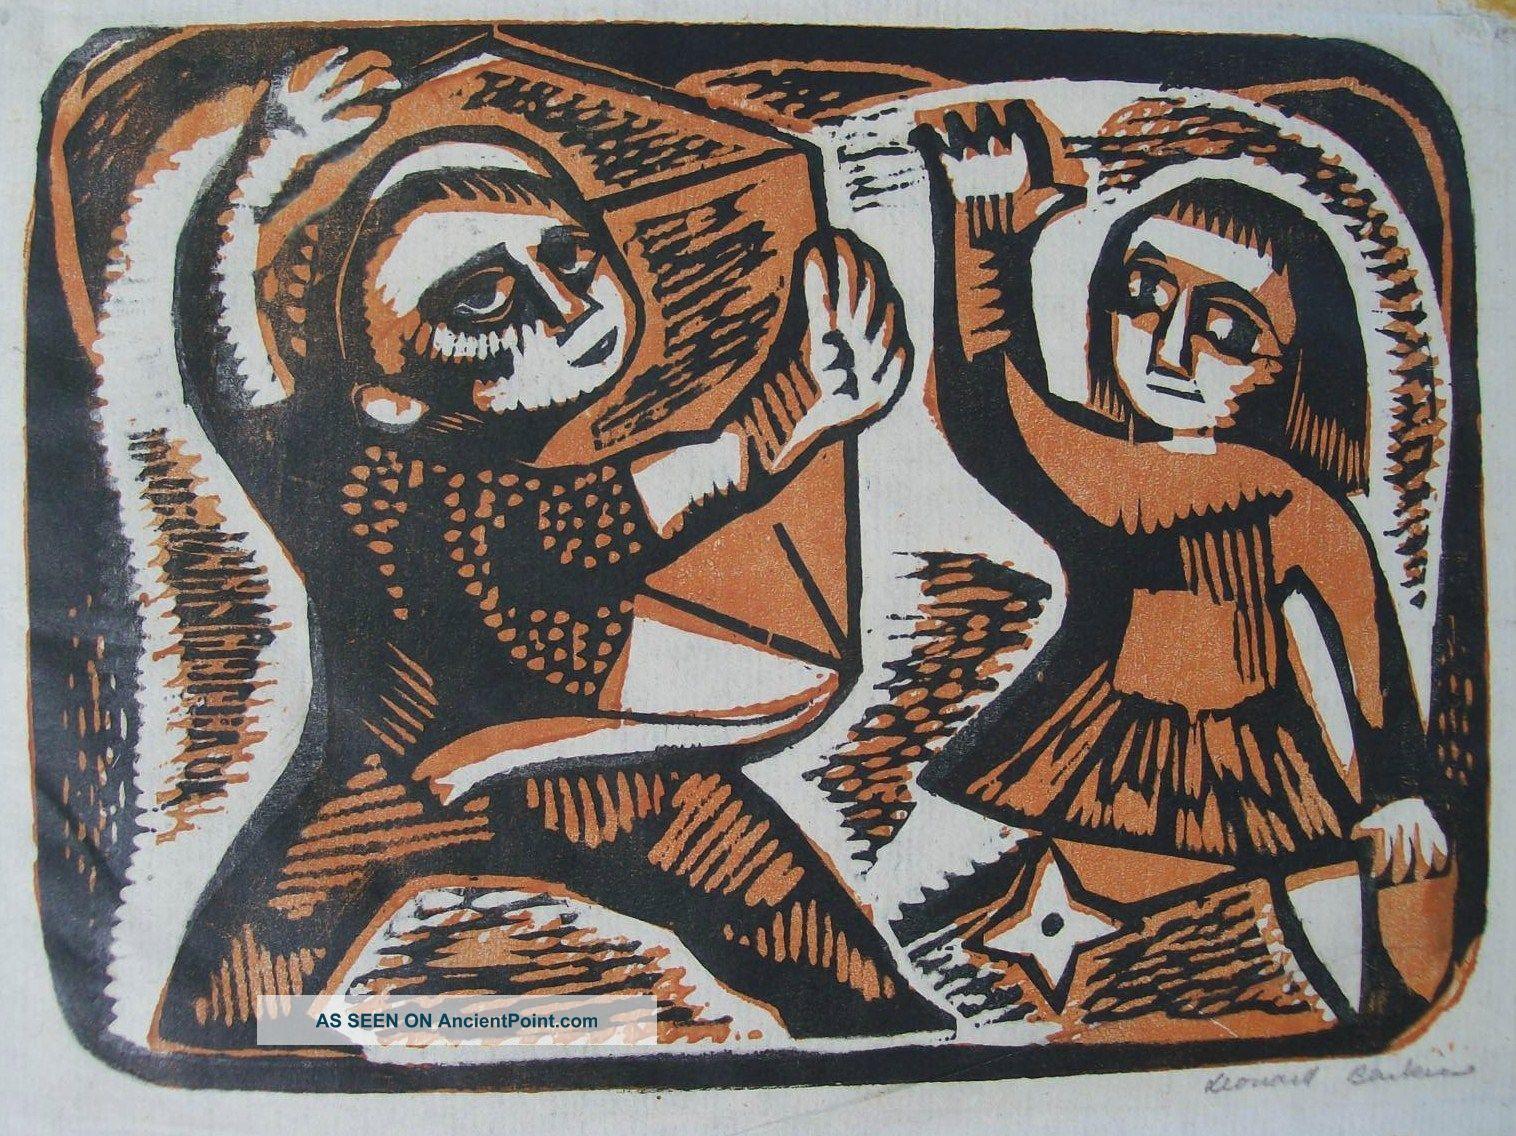 Leonard Baskin 1950s Pencil Signed Mid - Century Modernist Woodblock Print 13x8